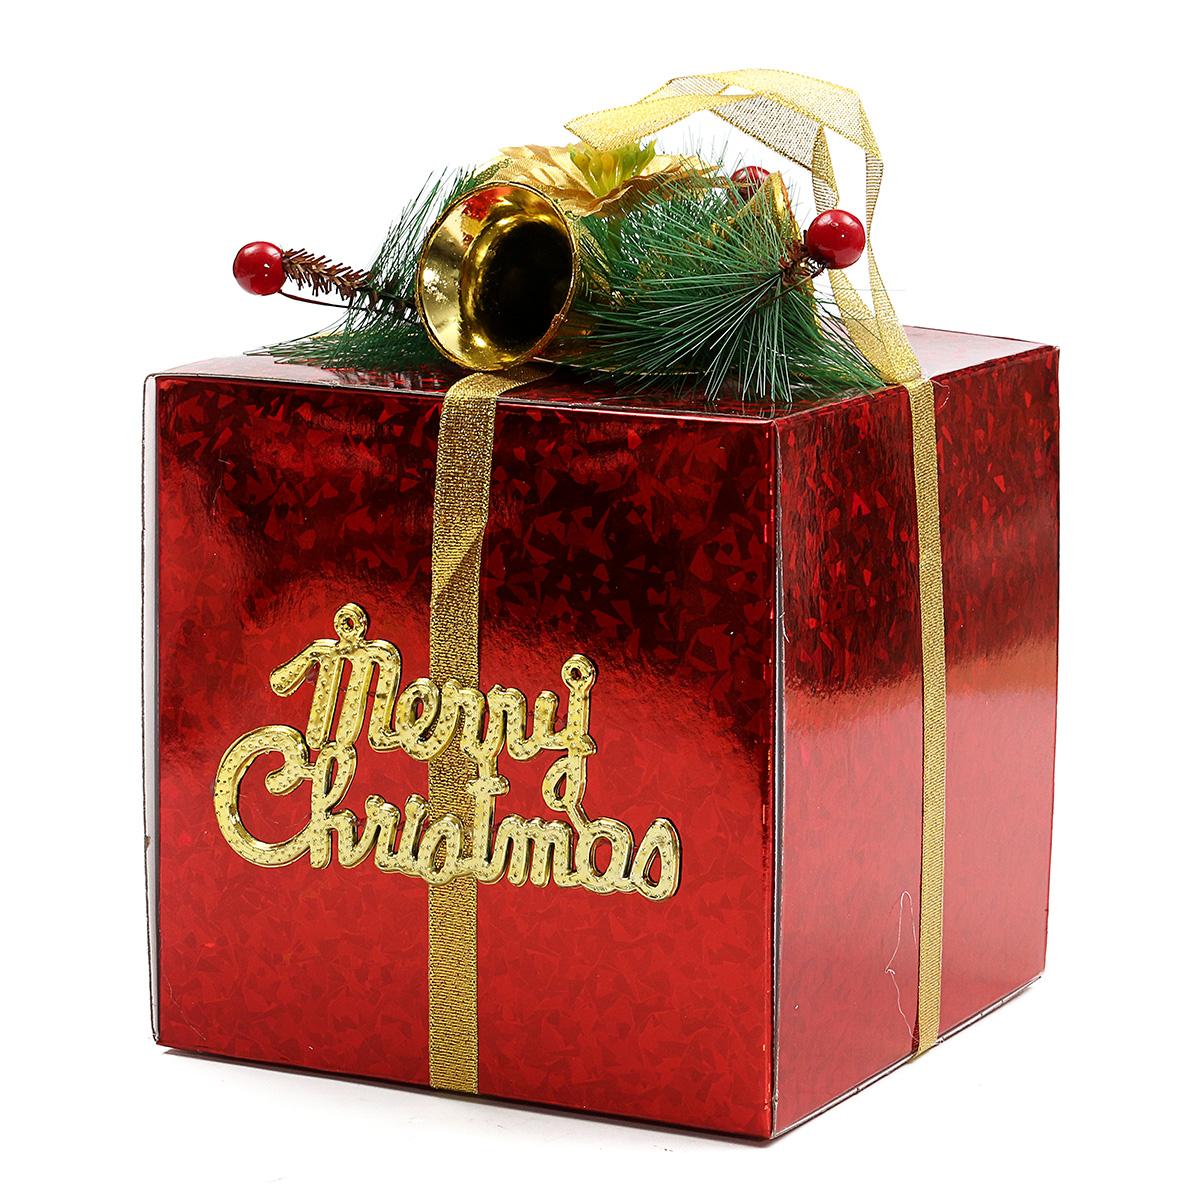 Gift Box Decoration Ideas: Glitter Christmas Gift Present Packing Box Ornament Xmas